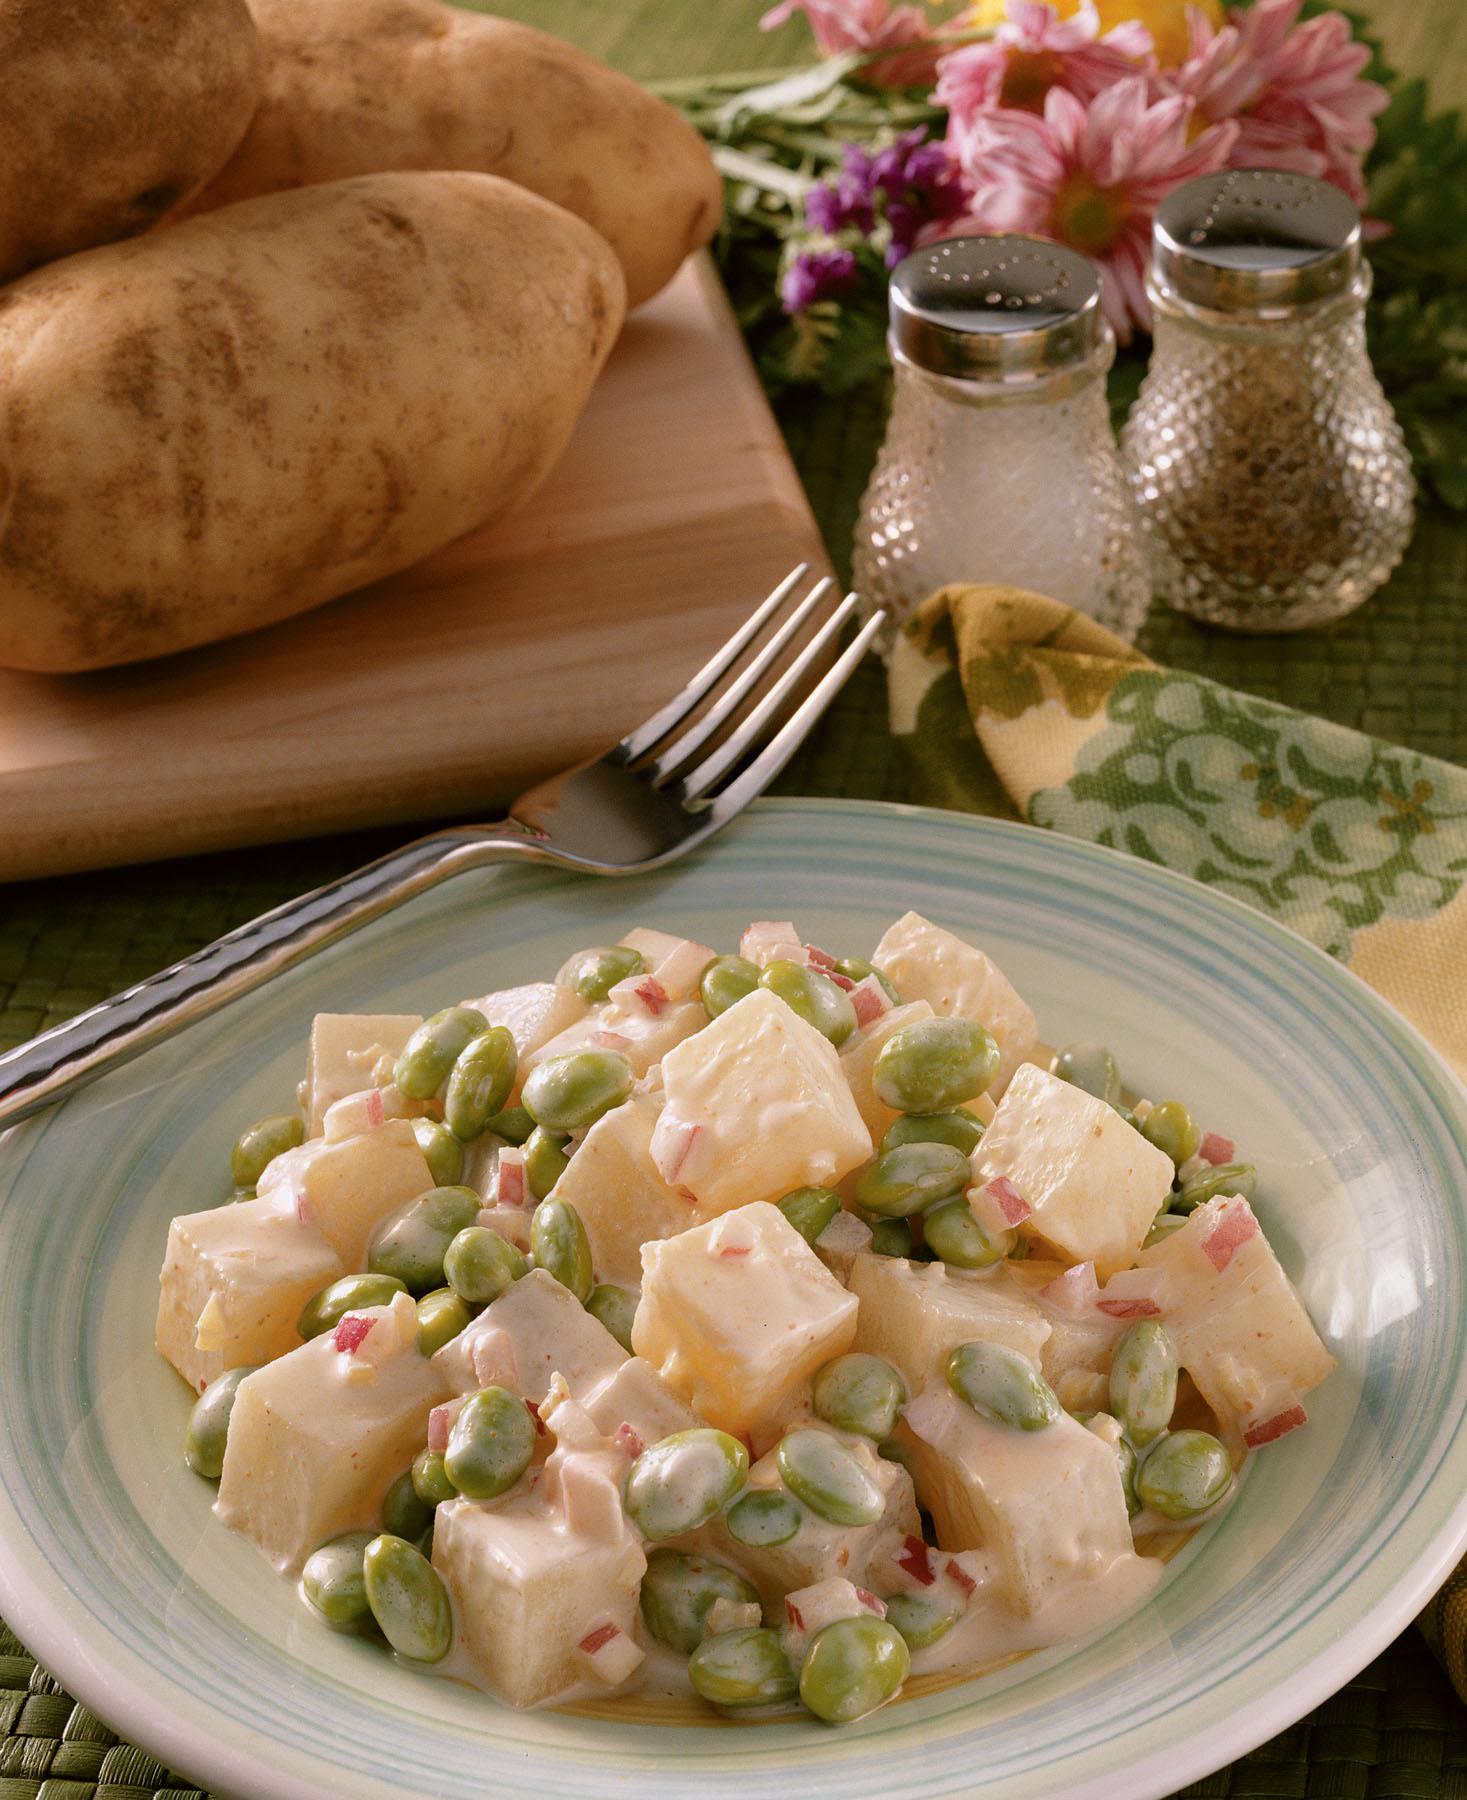 Potato and Edamame Salad